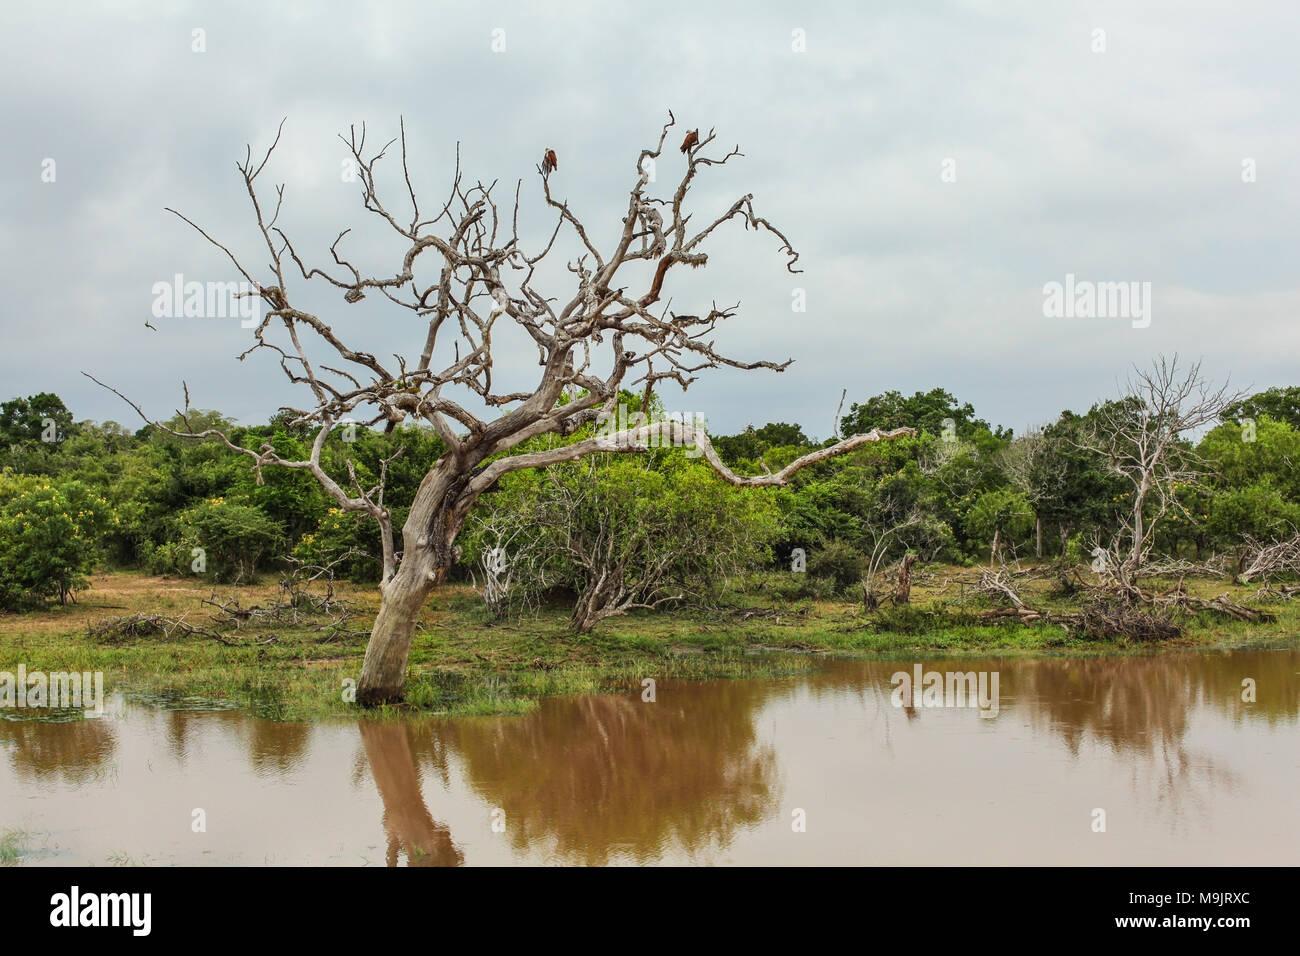 Two birds sitting on a dead tree in brown muddy lake. Yala National Park, Sri Lanka - Stock Image